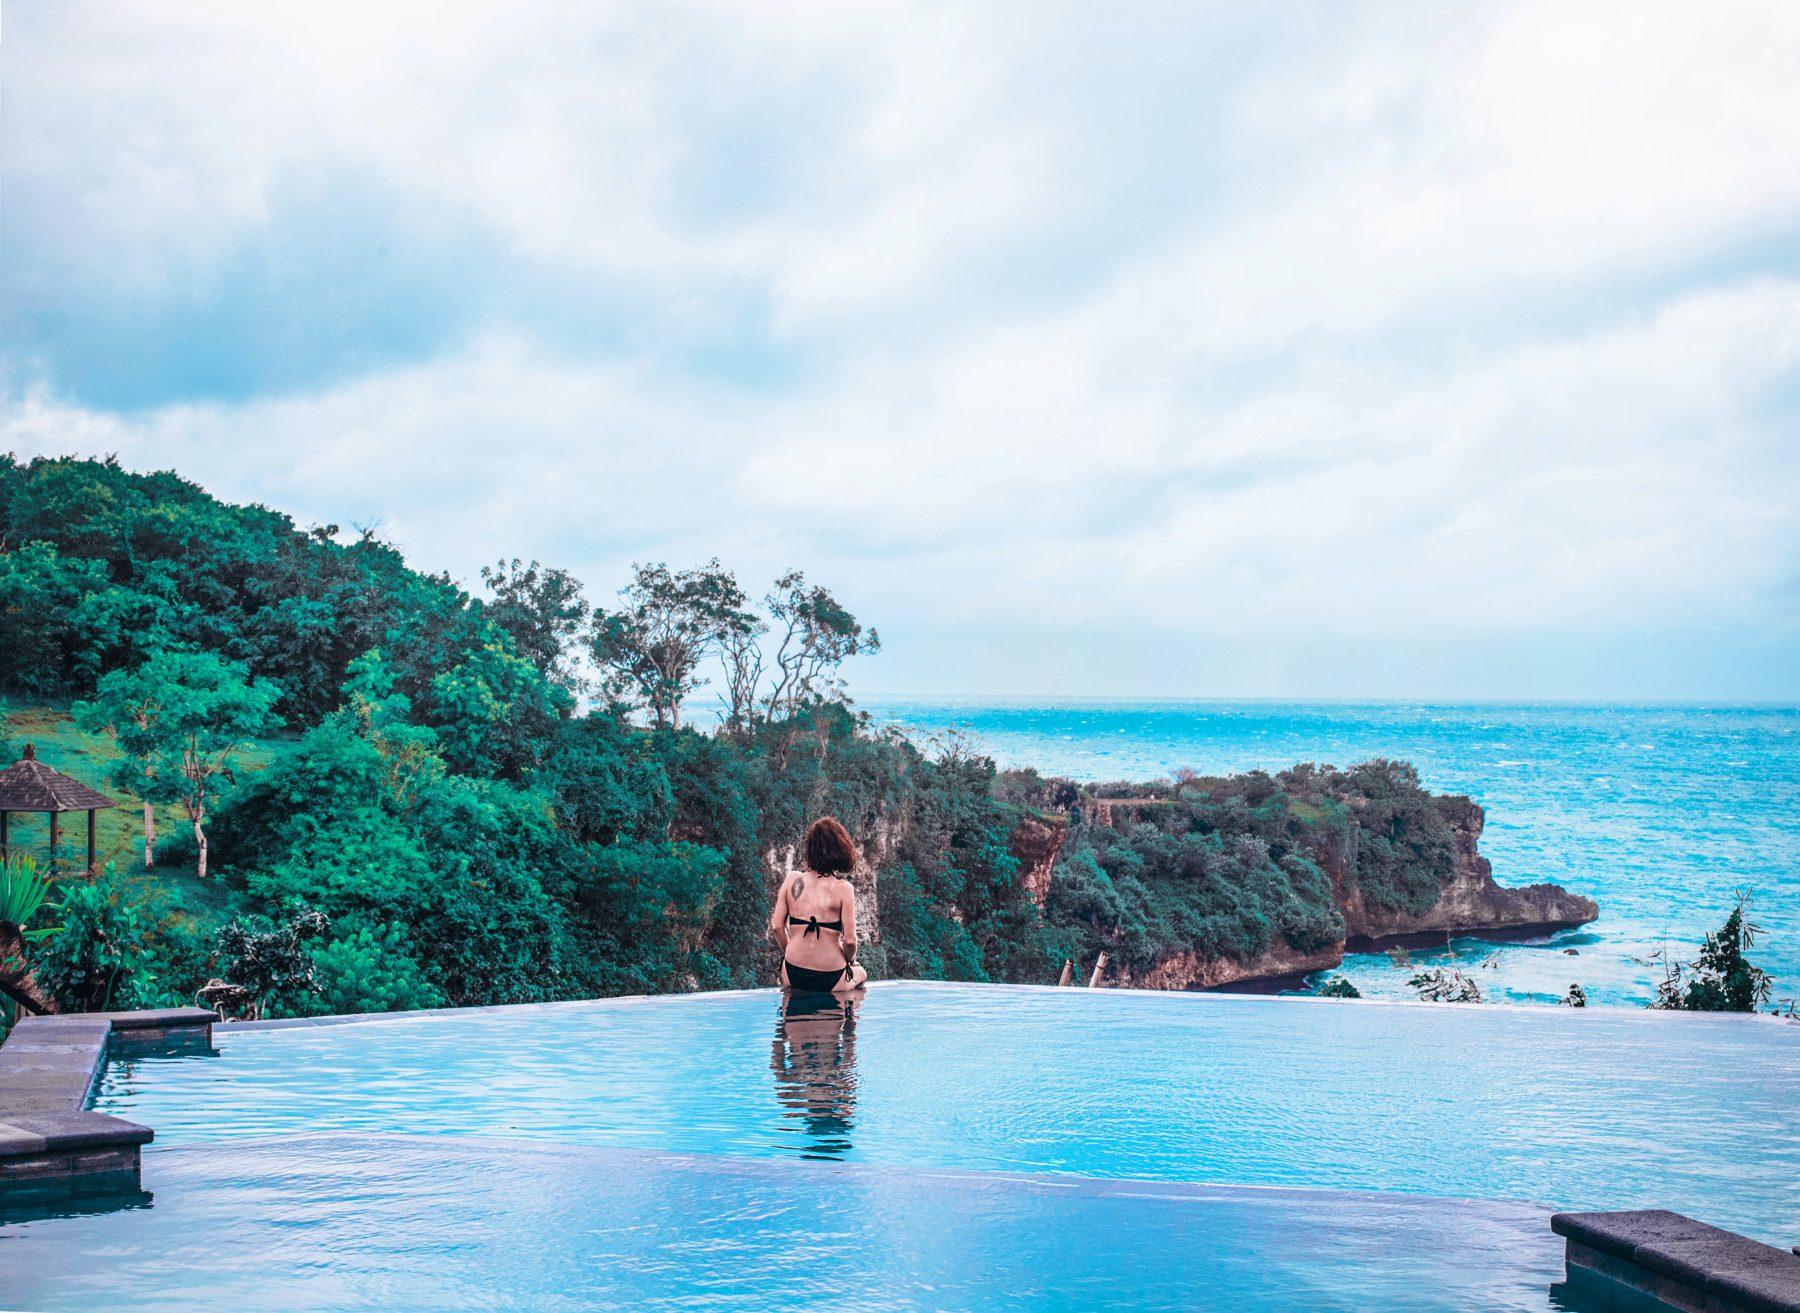 indianocean infinite pool spa day rainy season relaxing cloudy